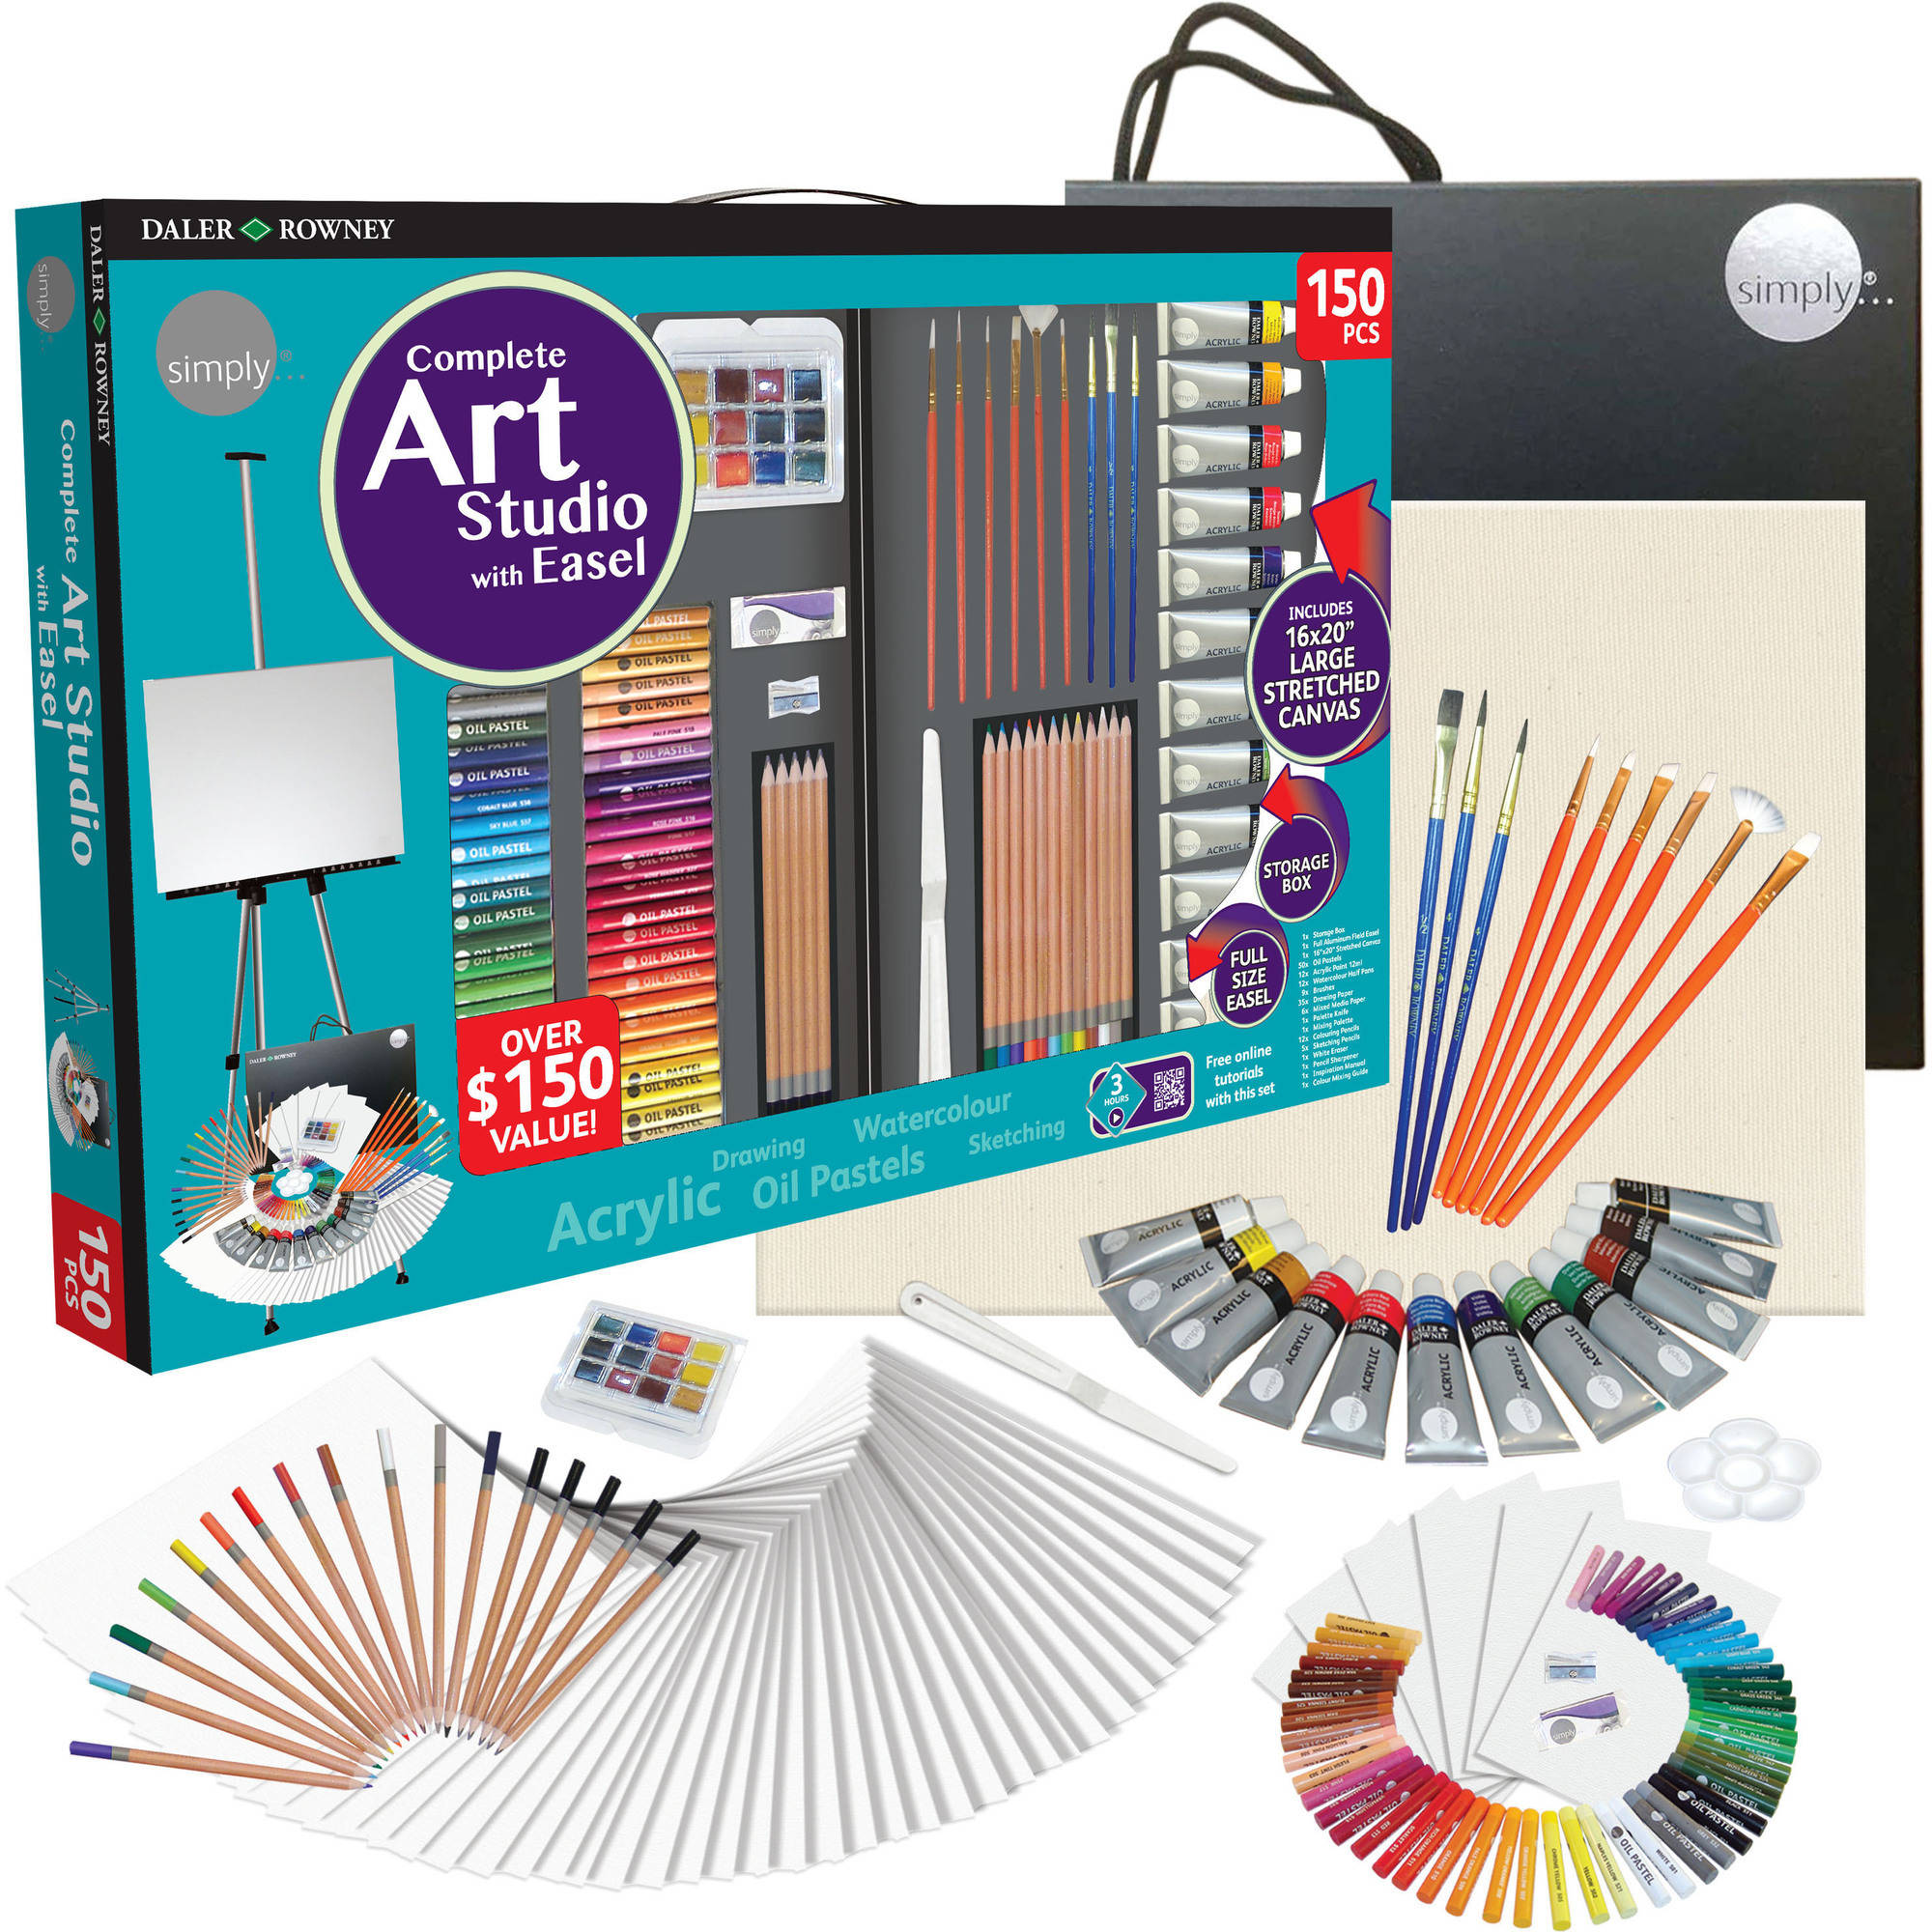 Daler Rowney Simply Complete Art Easel Studio Set 150 Piece Walmart Com